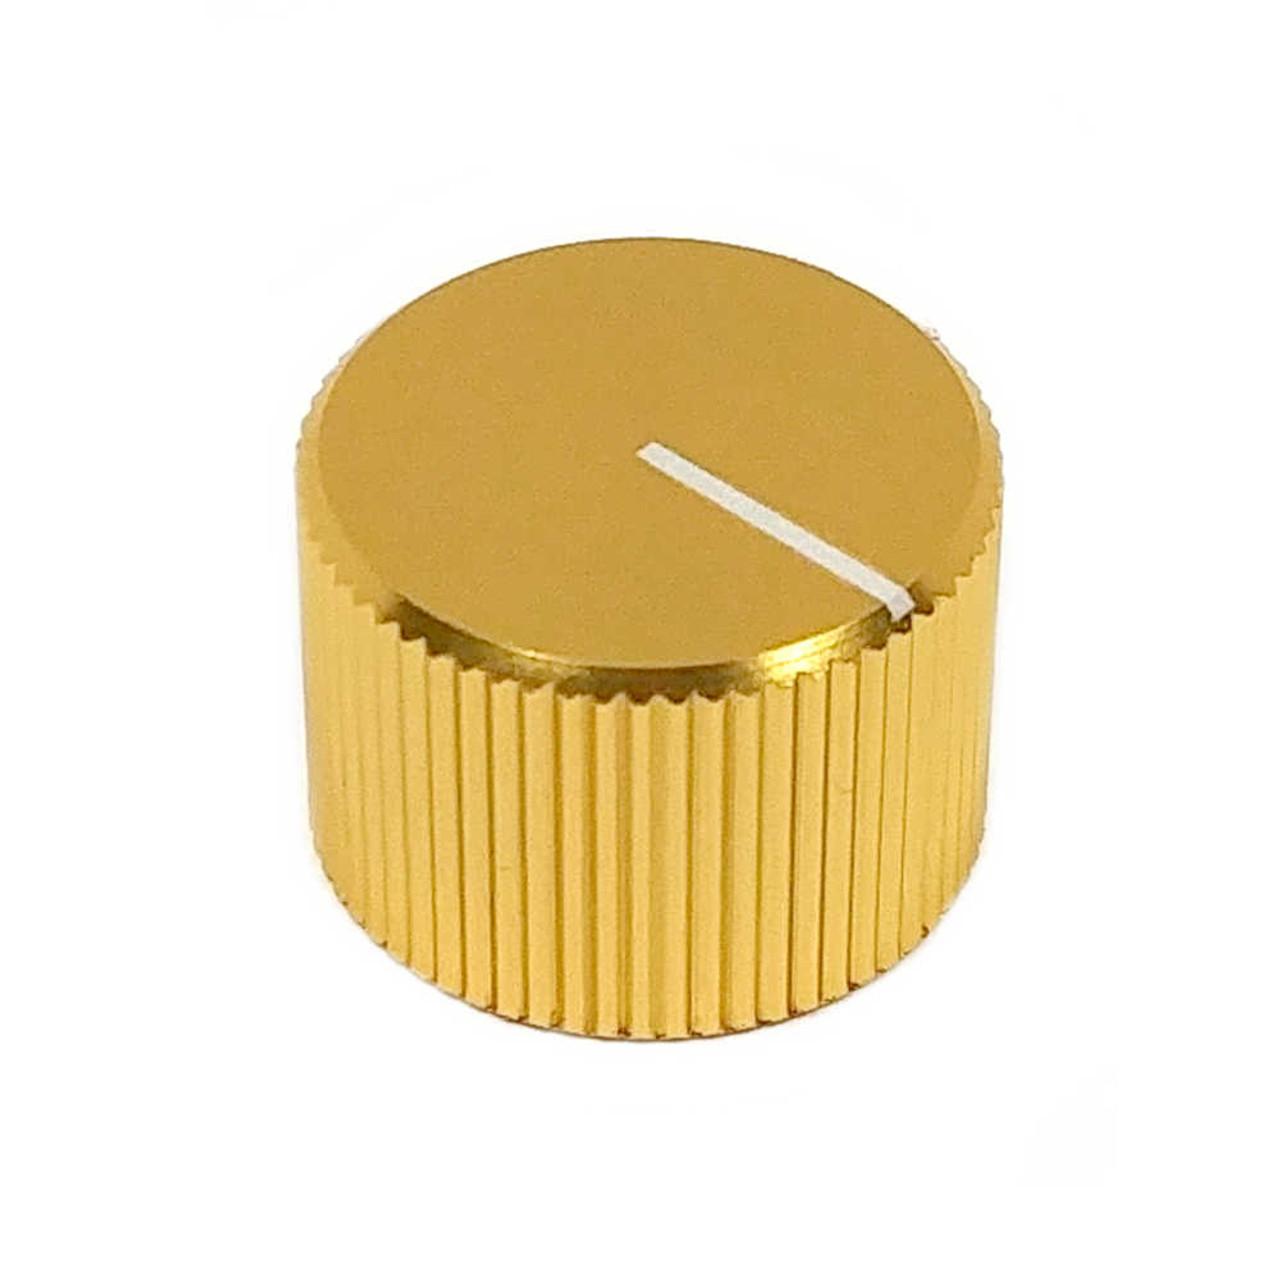 Anodized Aluminum Knob - Yellow